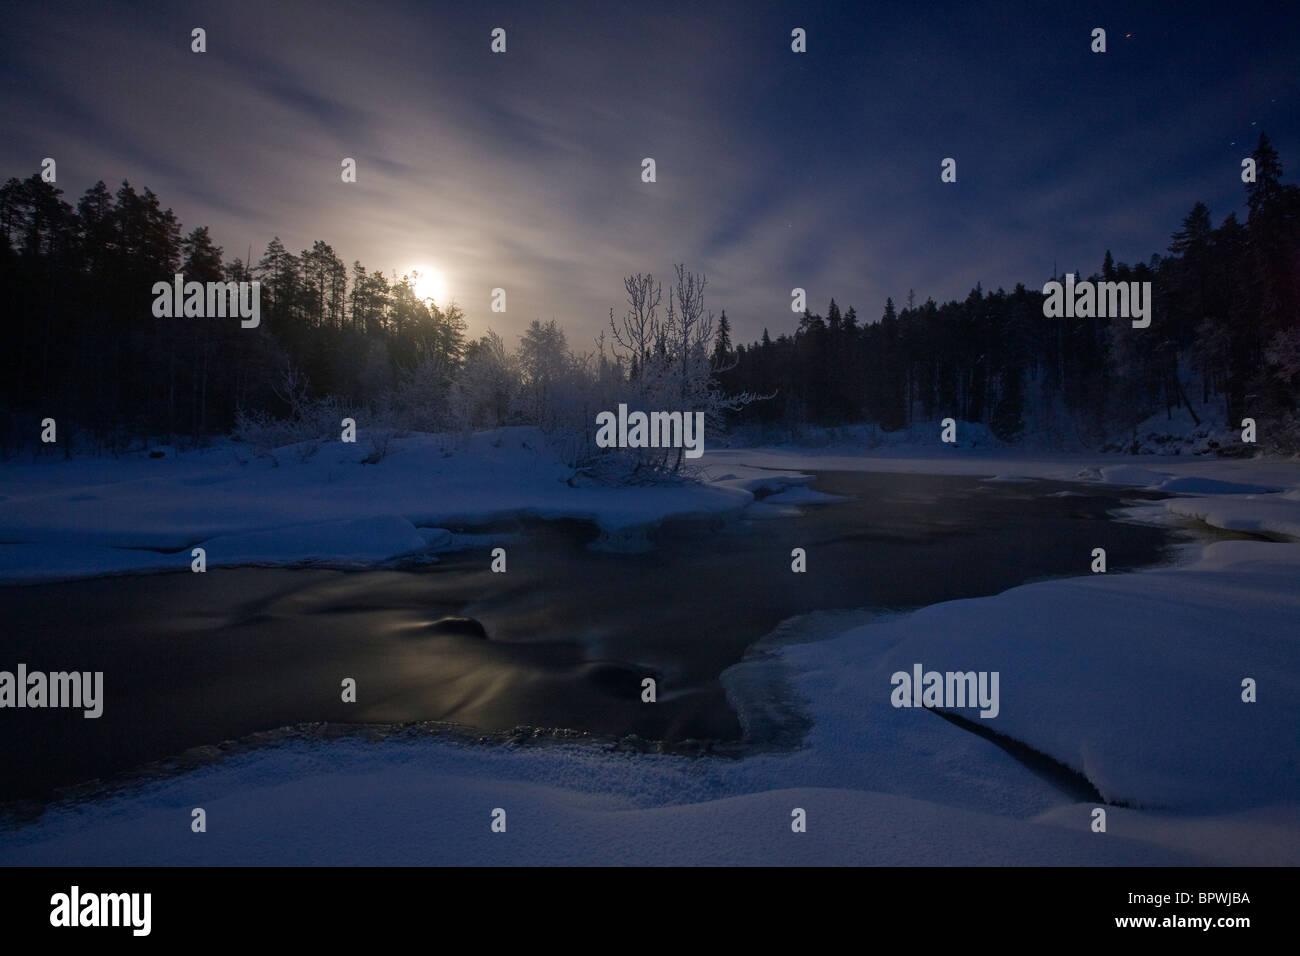 Lever sur la rivière Oulanka Oulanka National Park, en Finlande. Photo Stock